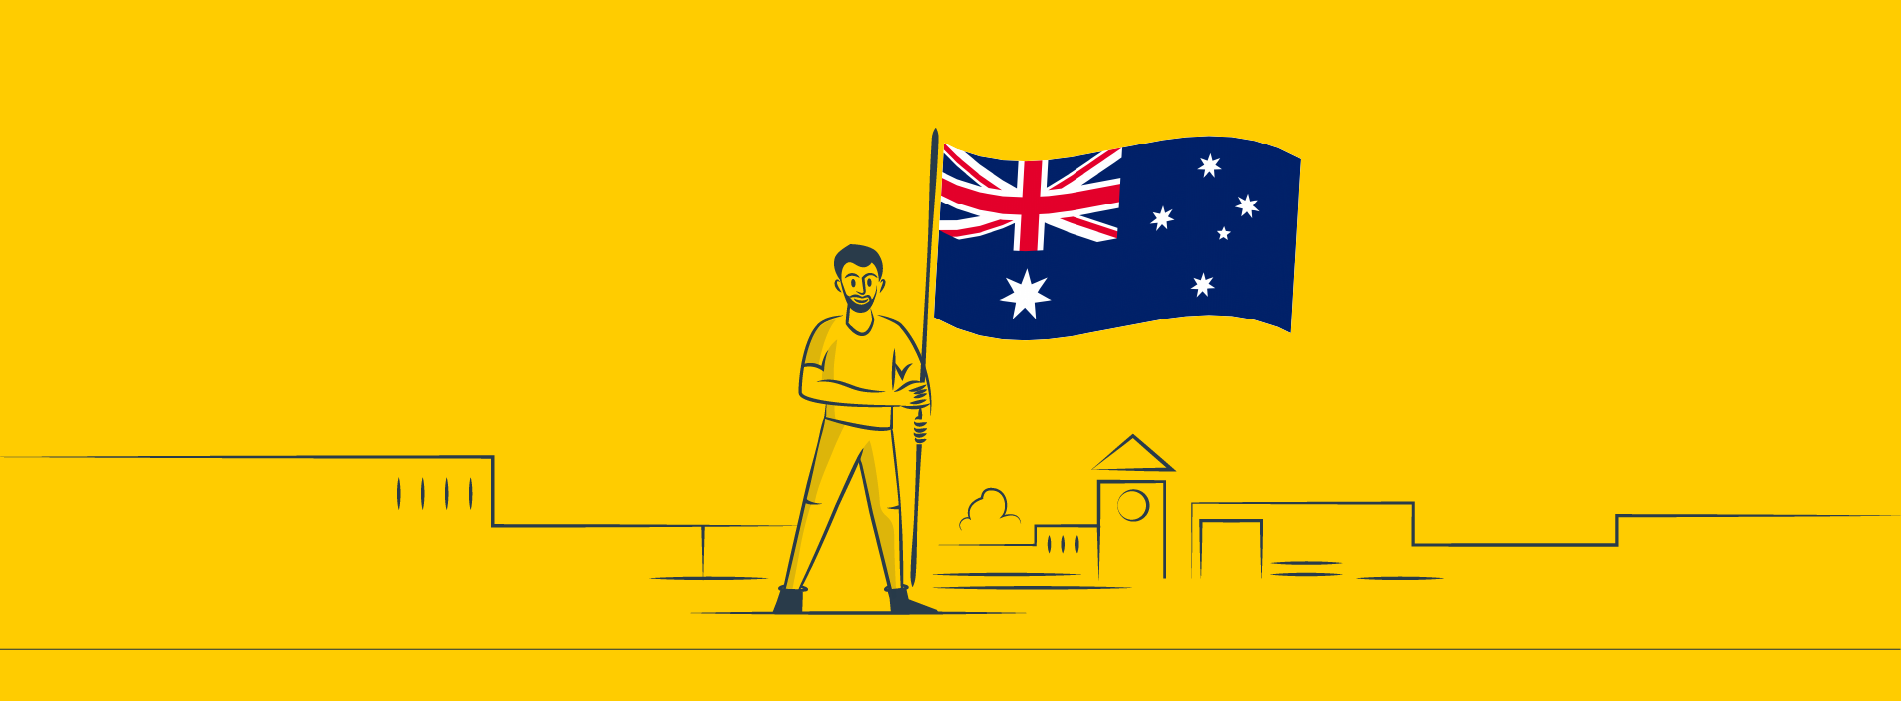 International-student-recruitment-agent-use-in-Australia